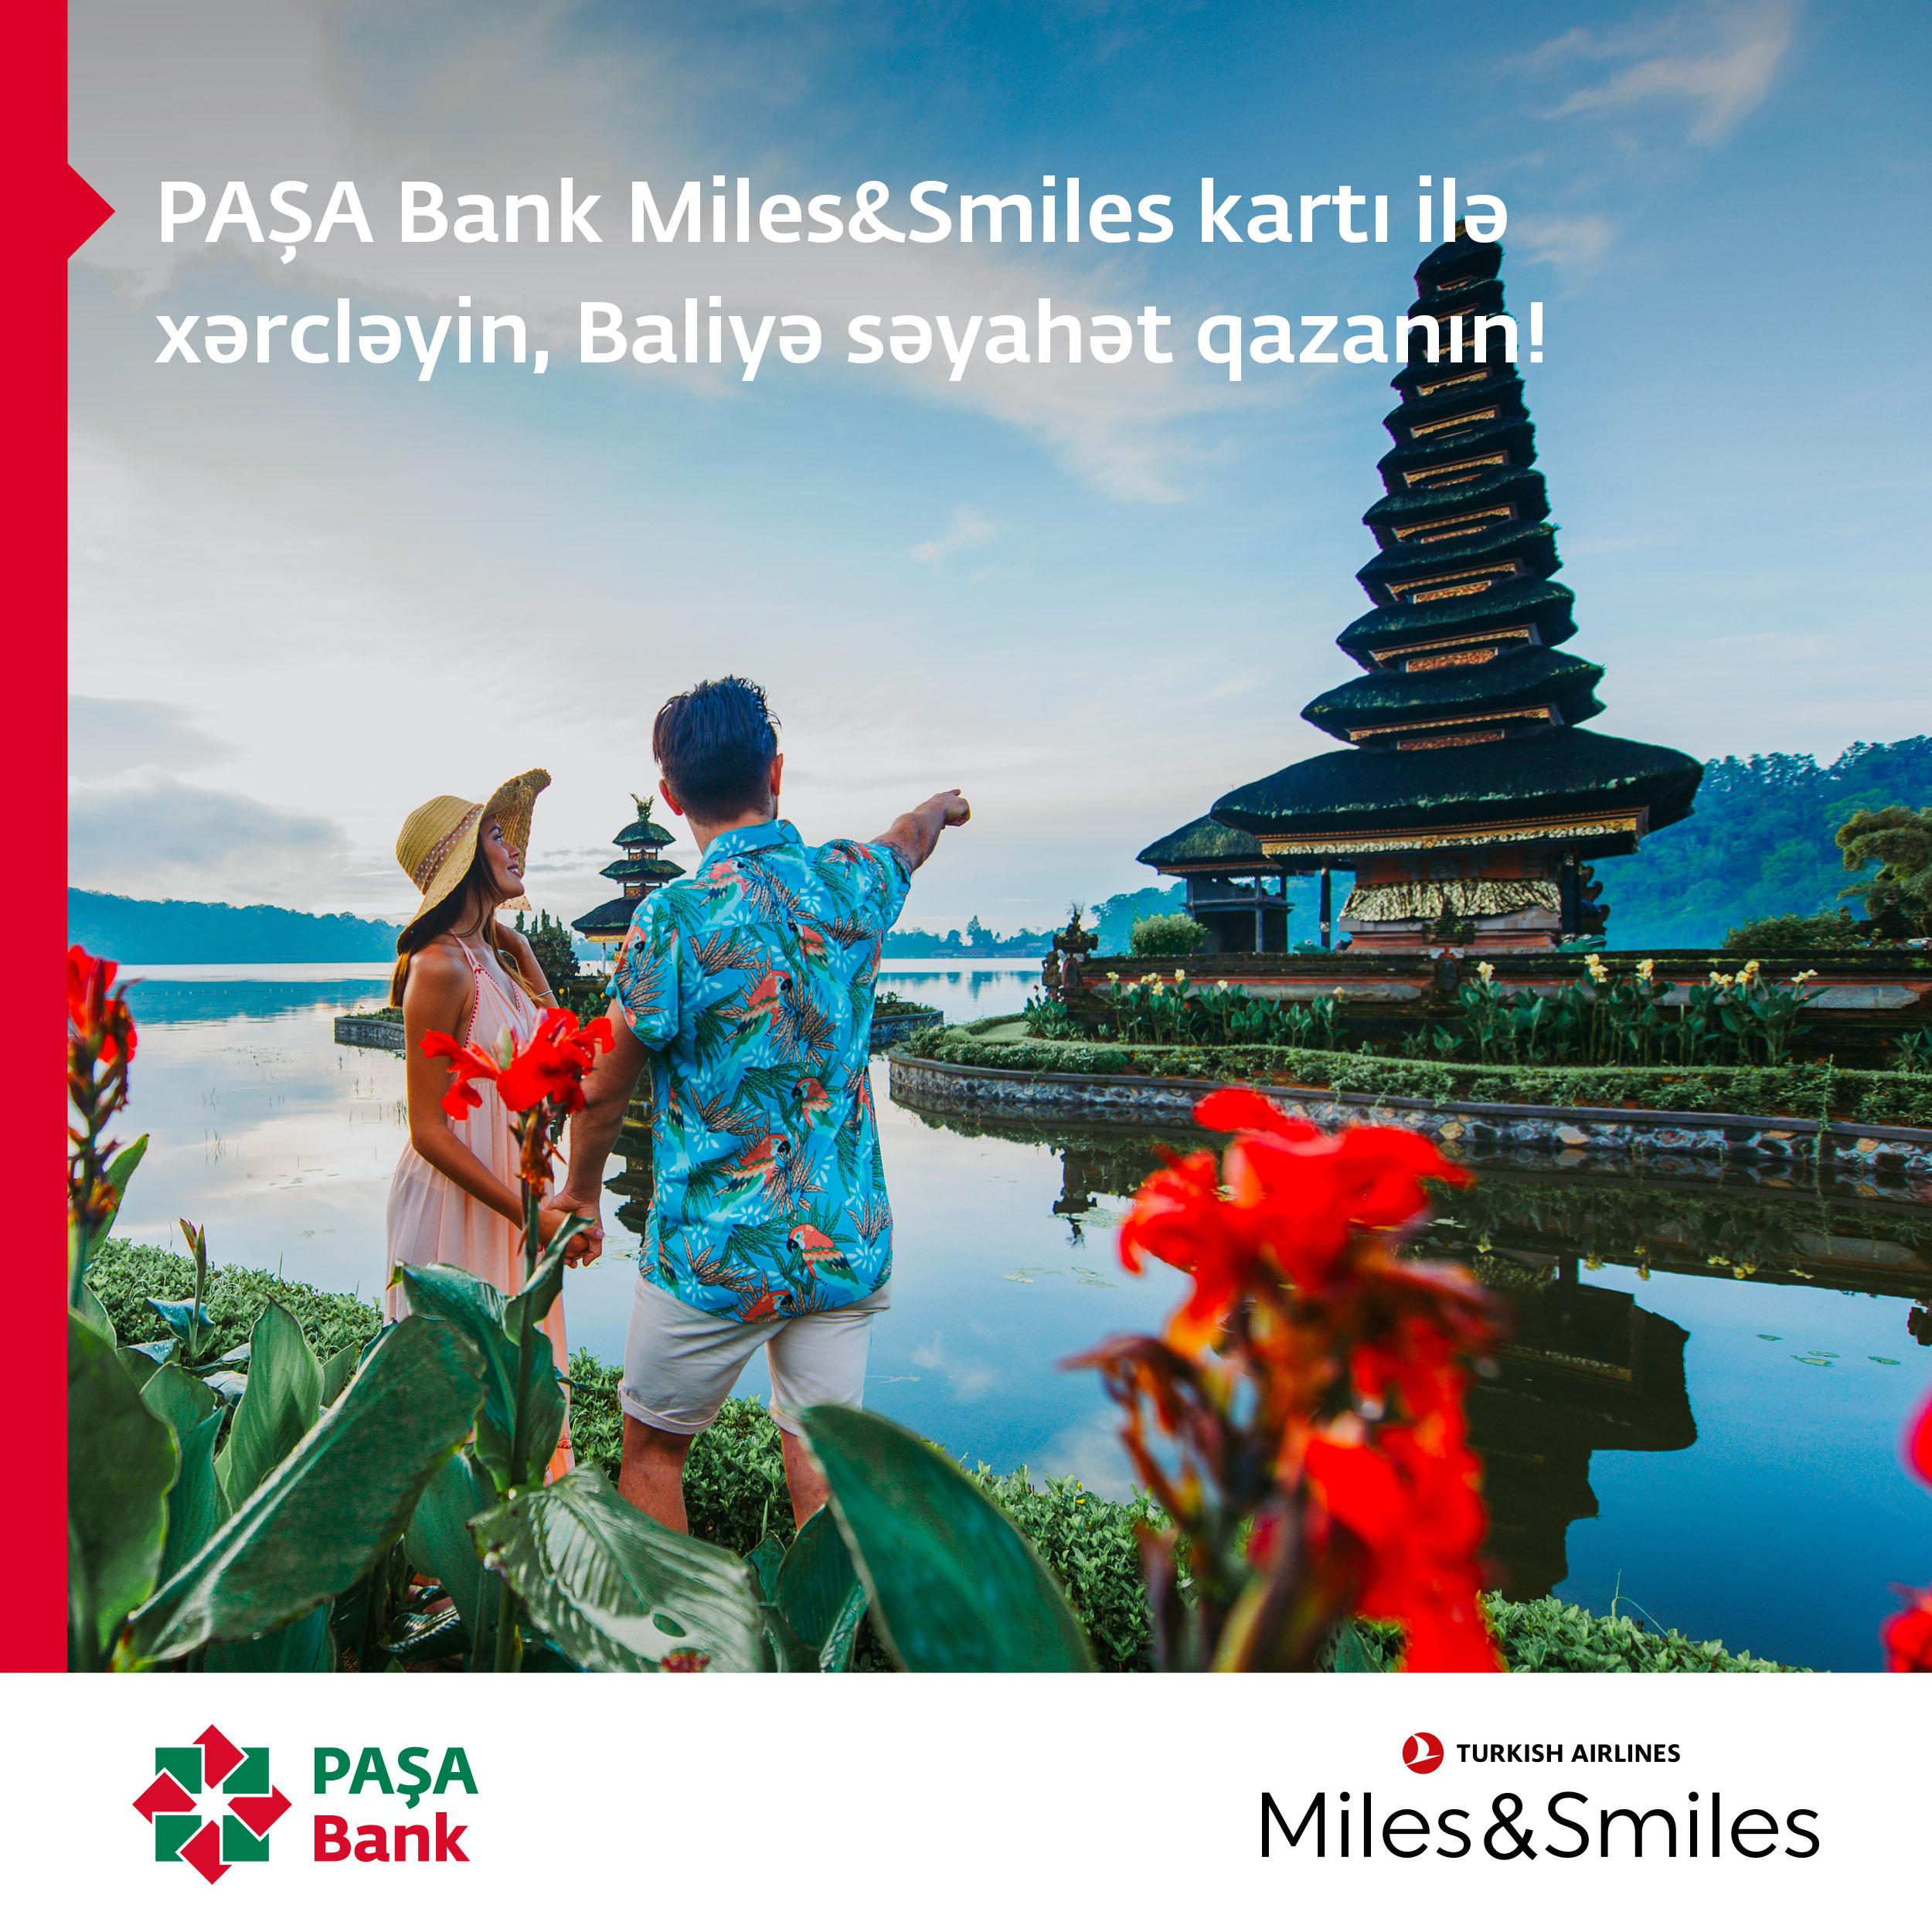 Bali.jpg (951 KB)